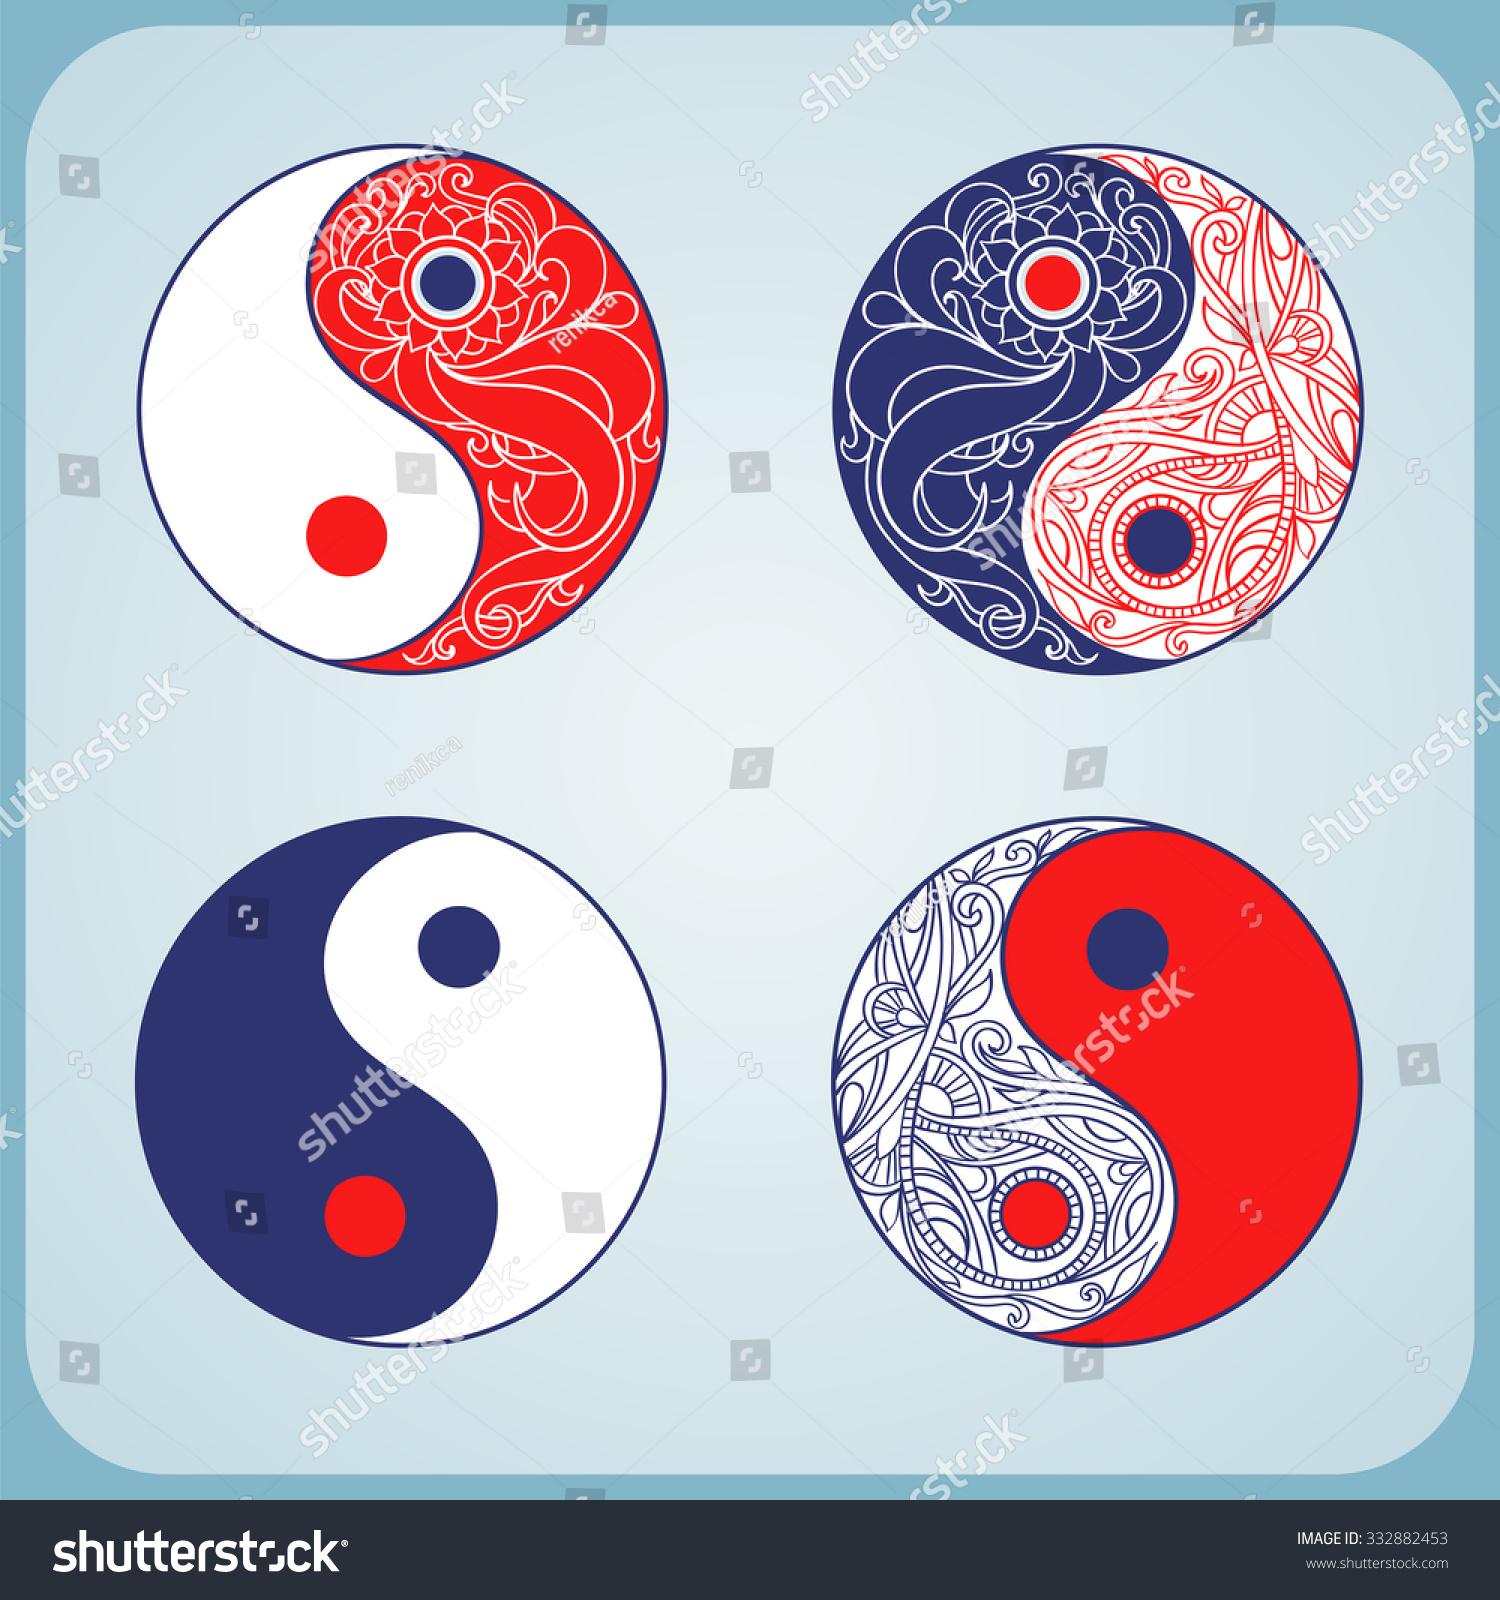 Yin yang set symbols allegory opposites stock vector 332882453 yin yang set of symbols as an allegory of opposites and philosophy of life buycottarizona